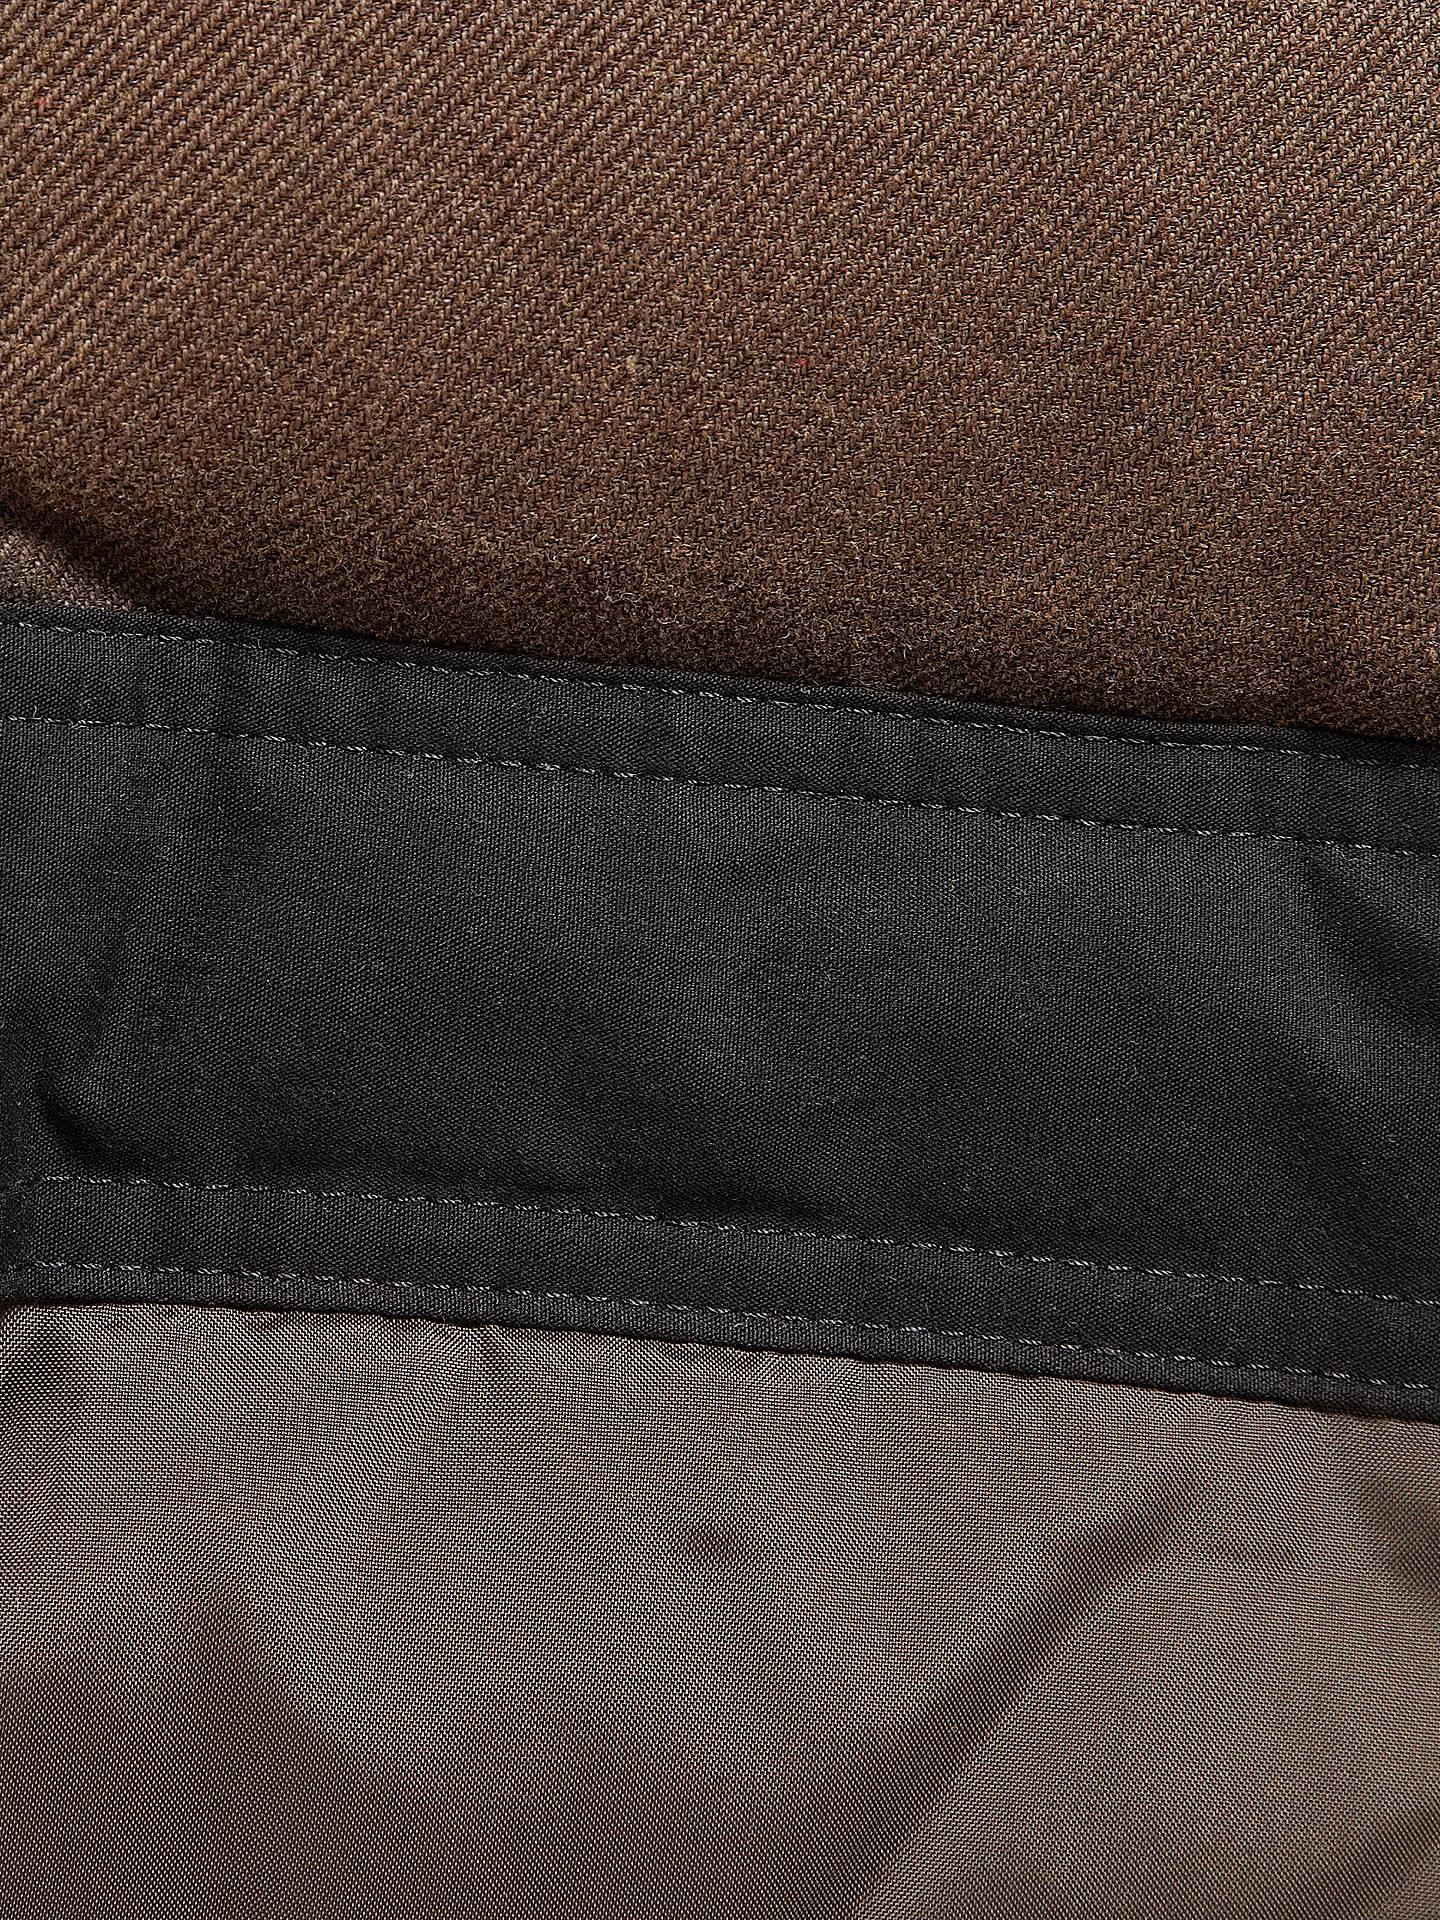 6cb745eba Timberland Wilmington Long Parka Jacket at John Lewis & Partners